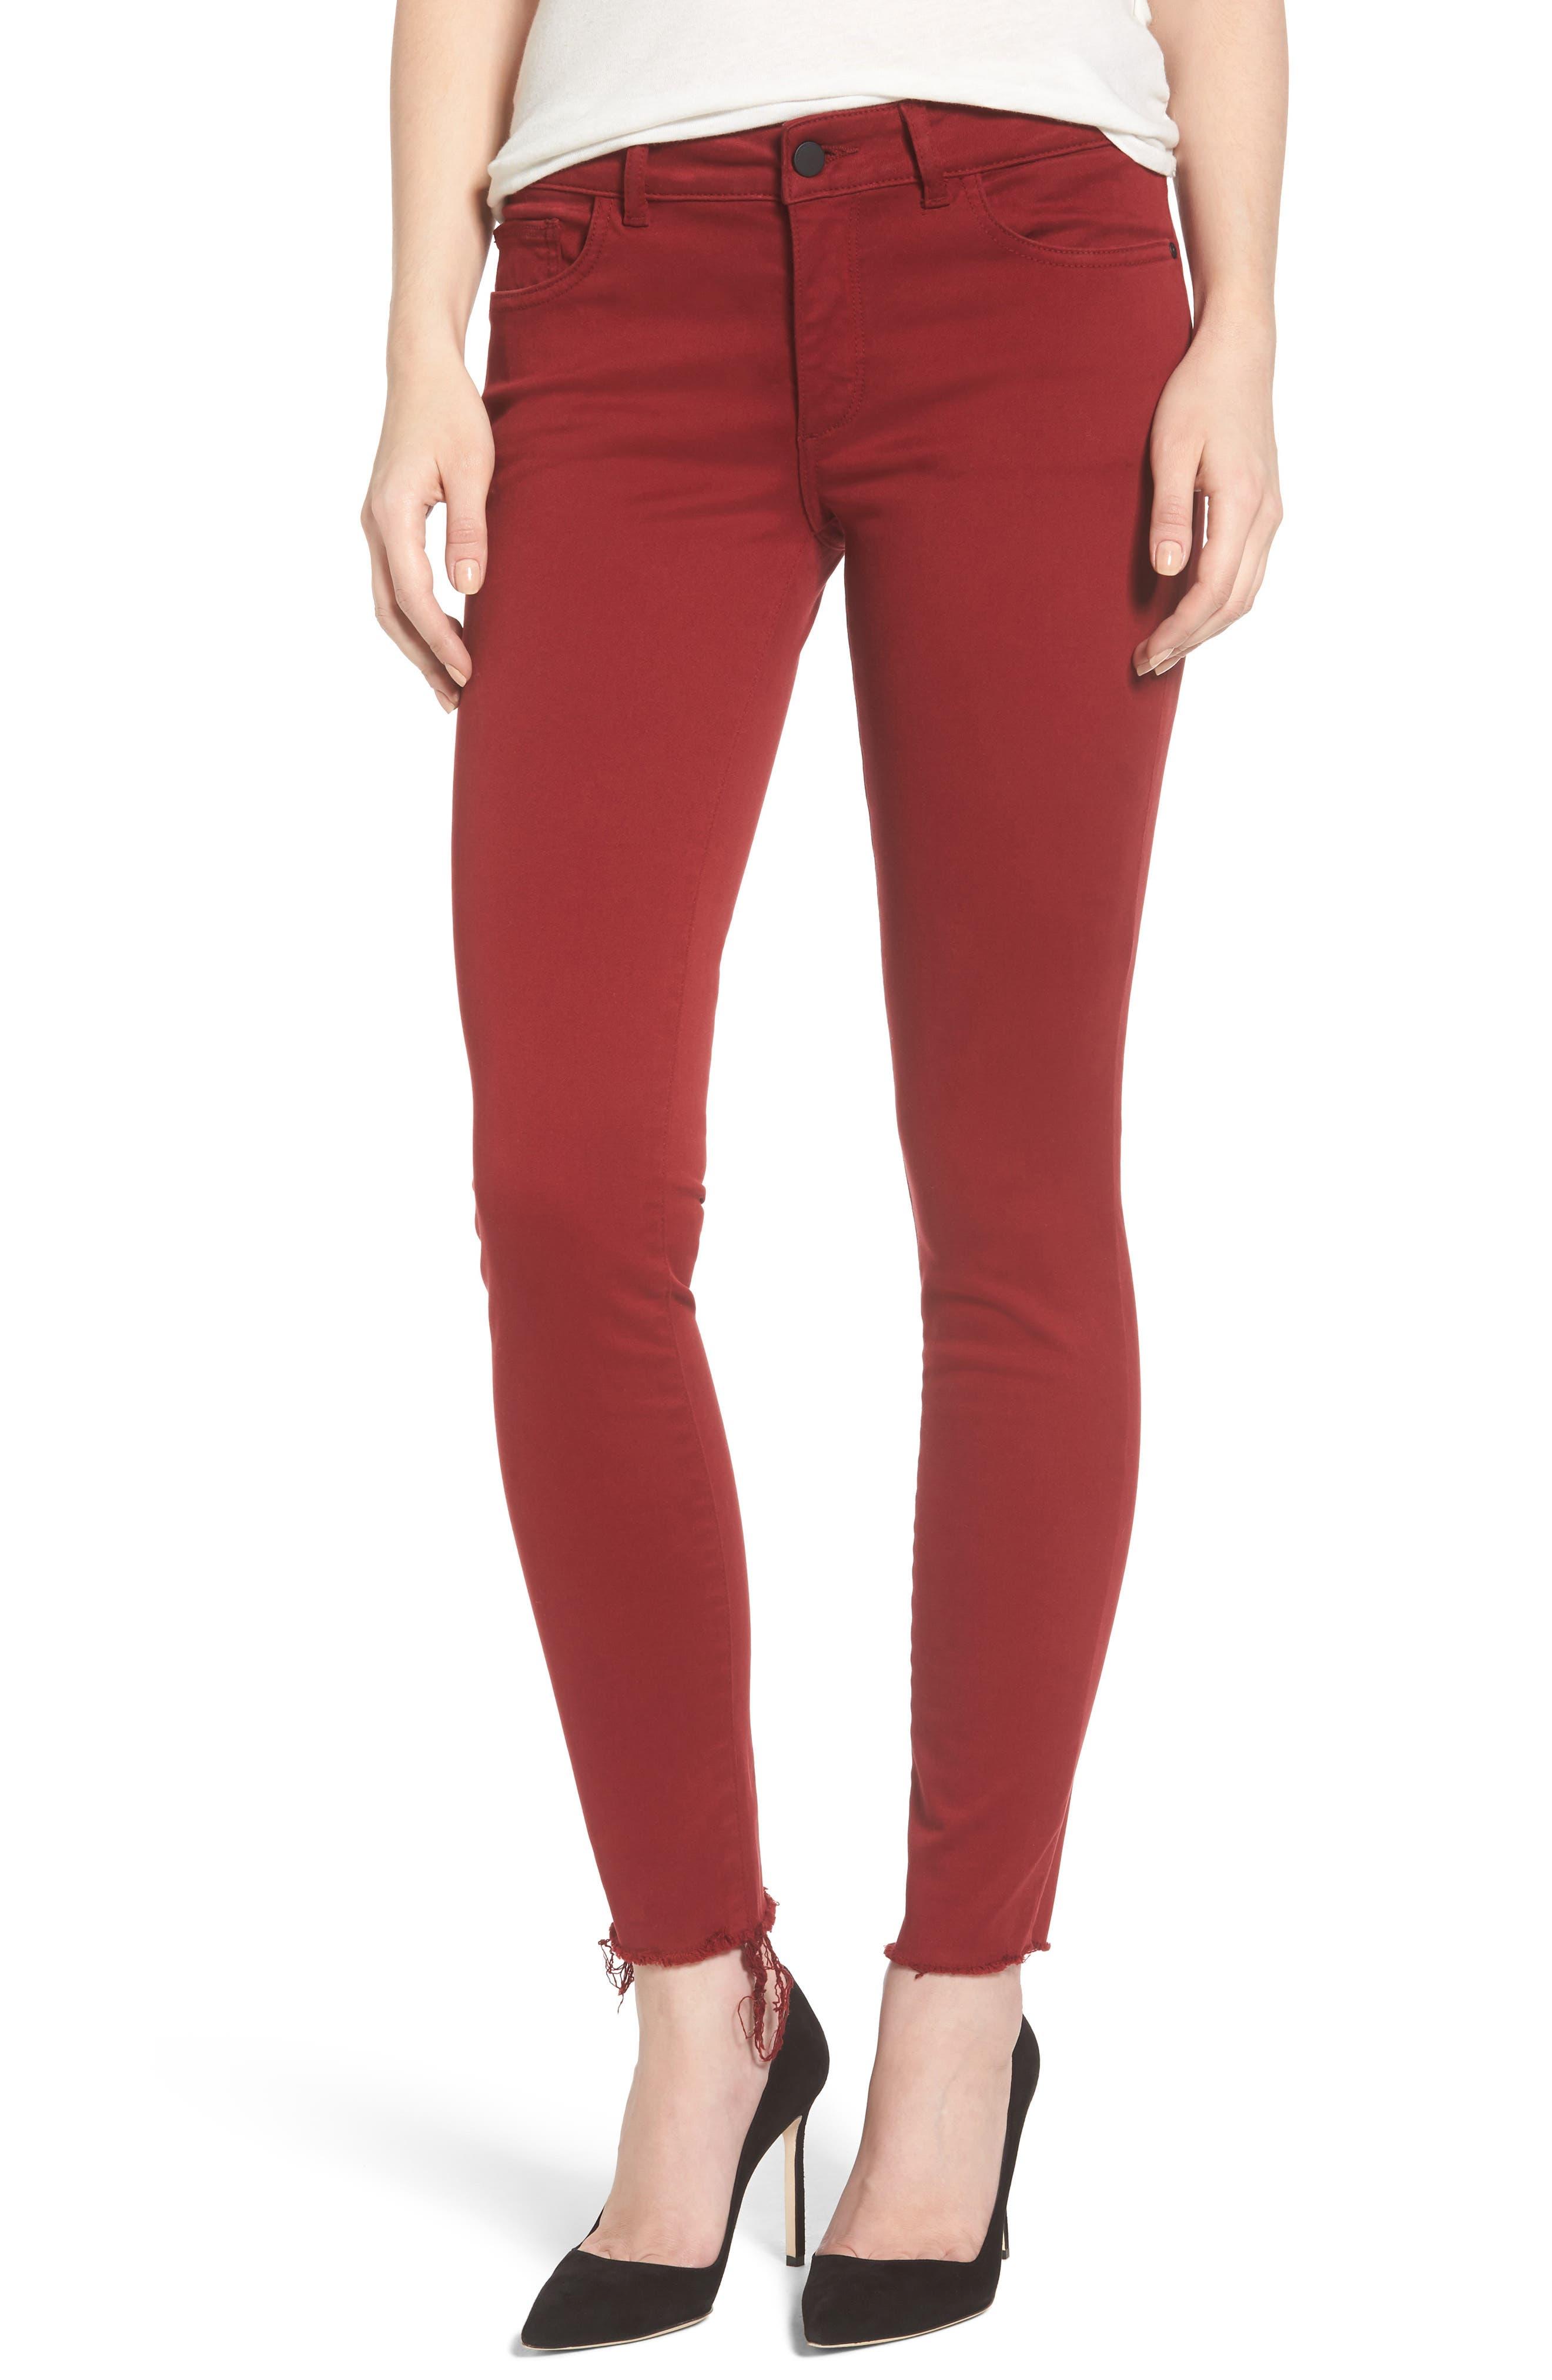 Emma Power Legging Jeans,                         Main,                         color, Rhubarb